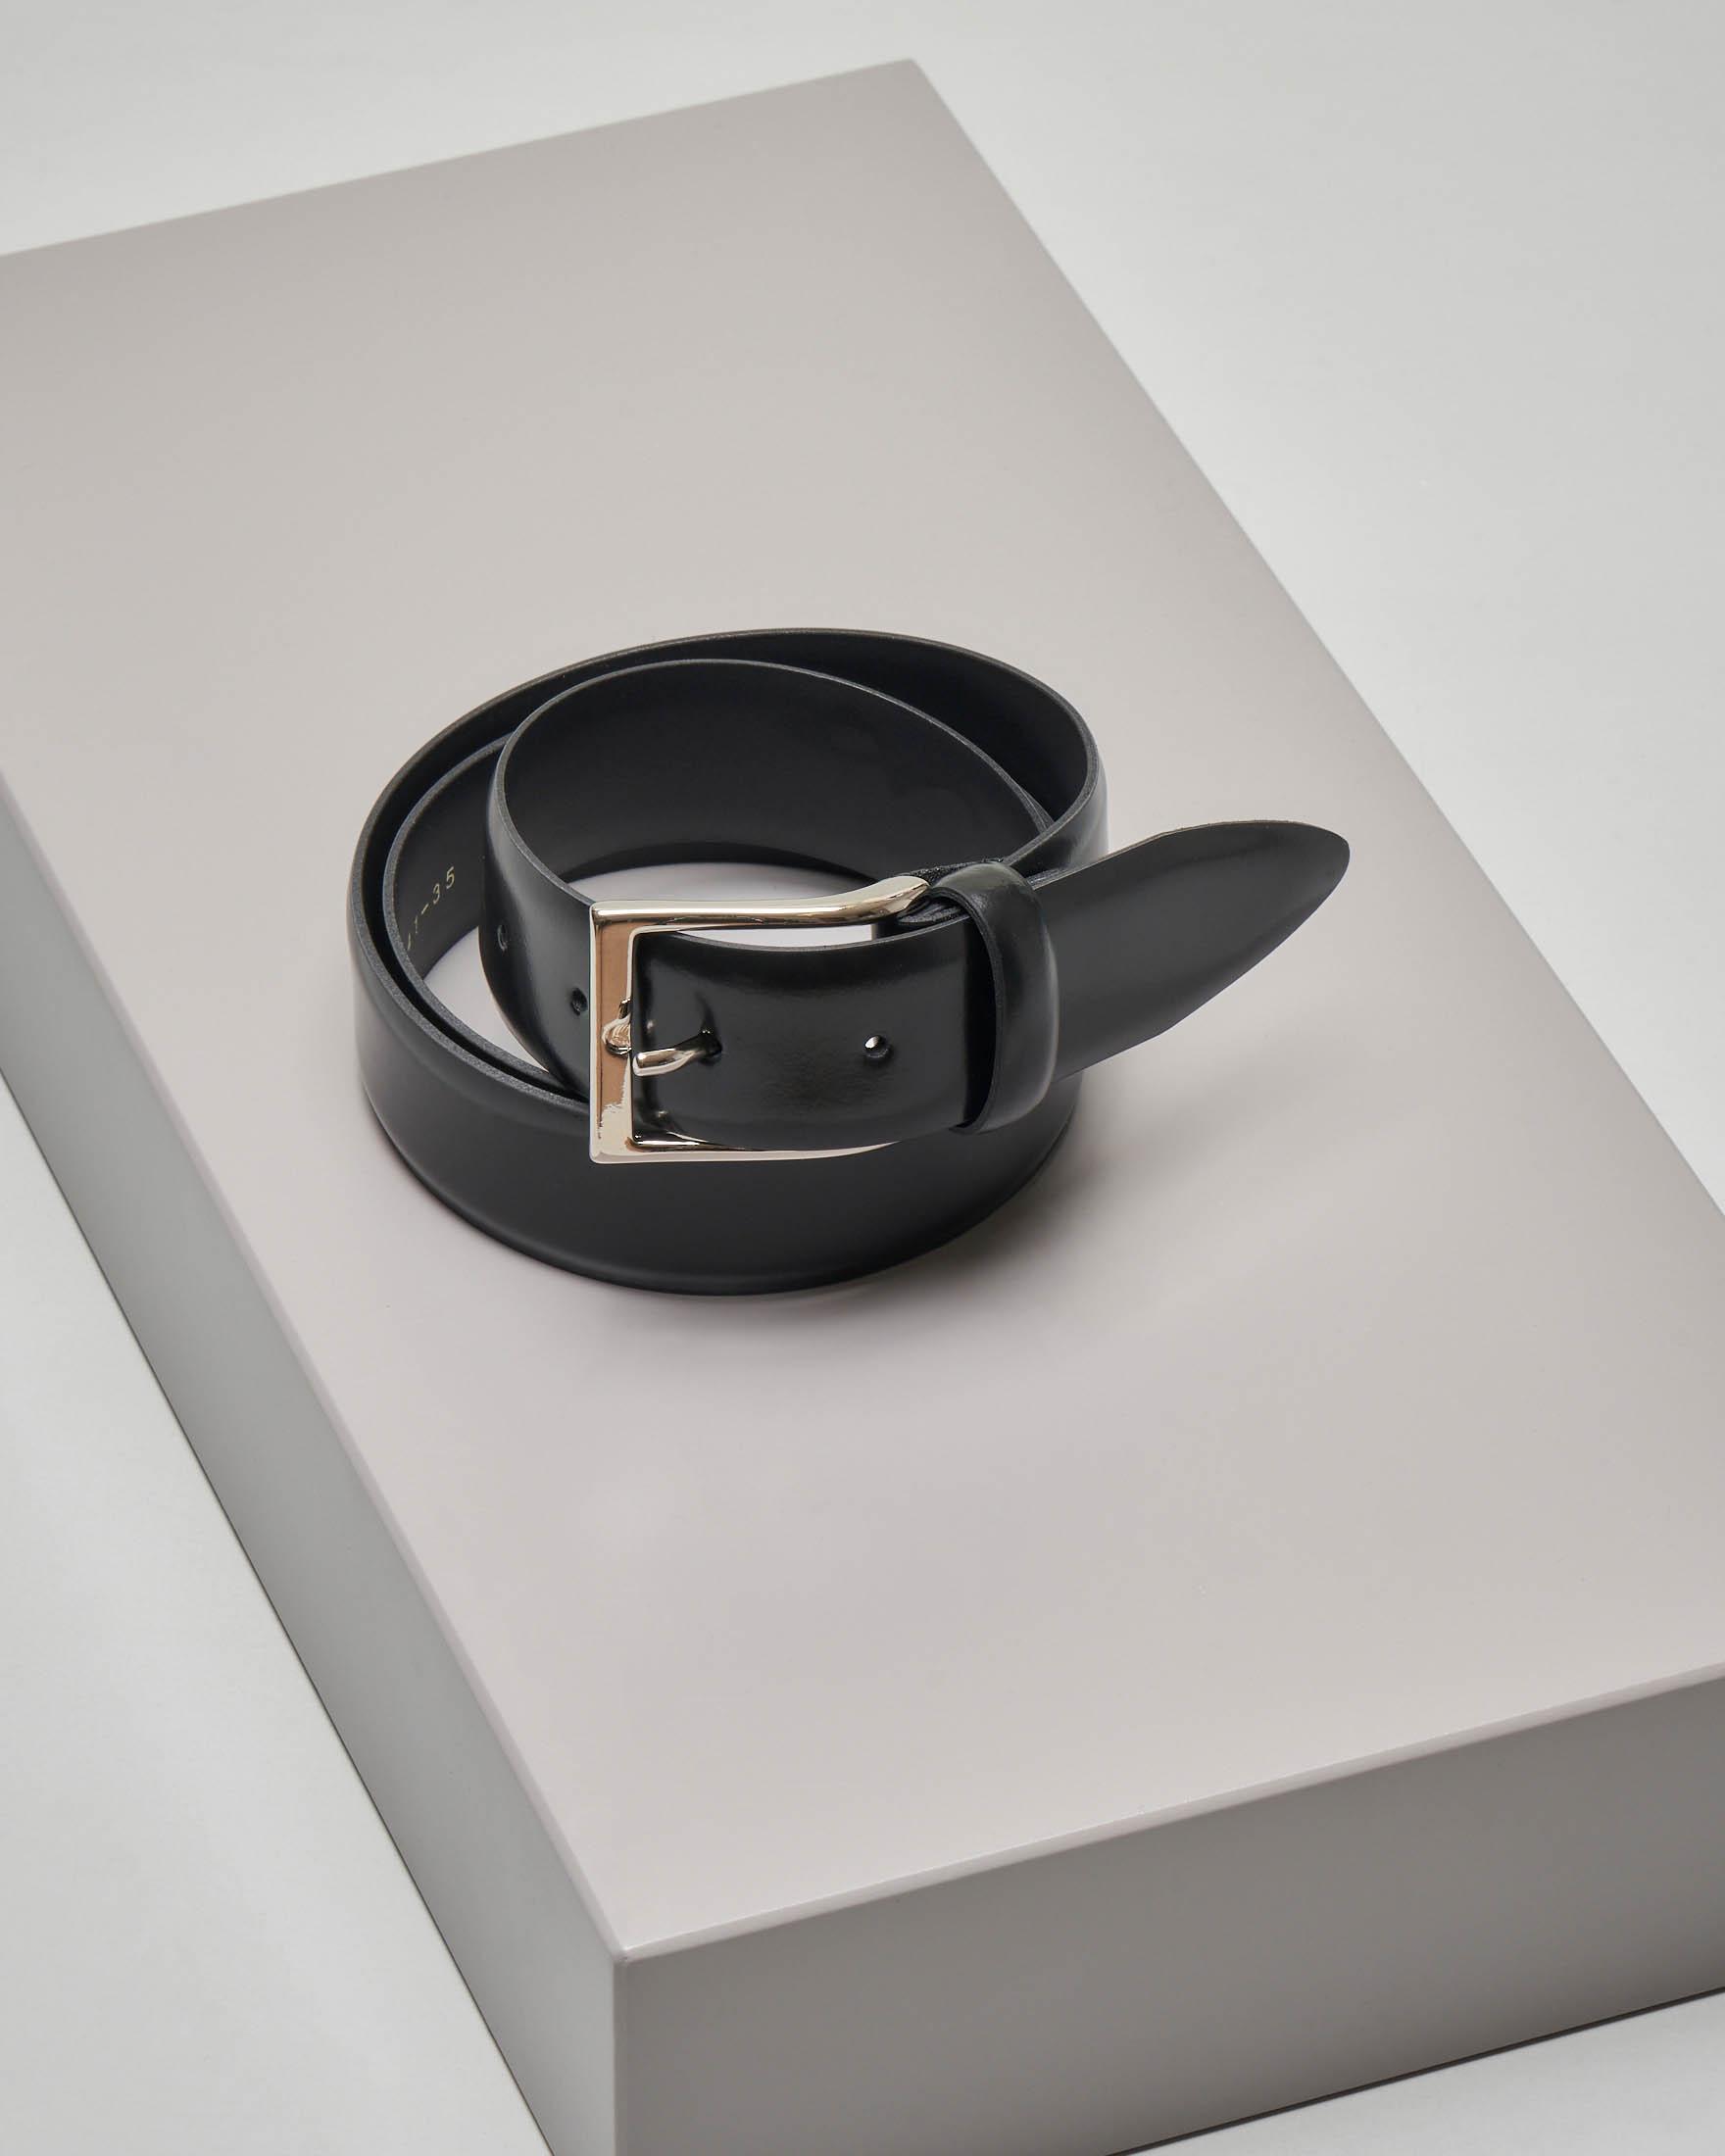 Cintura nera in pelle lucida